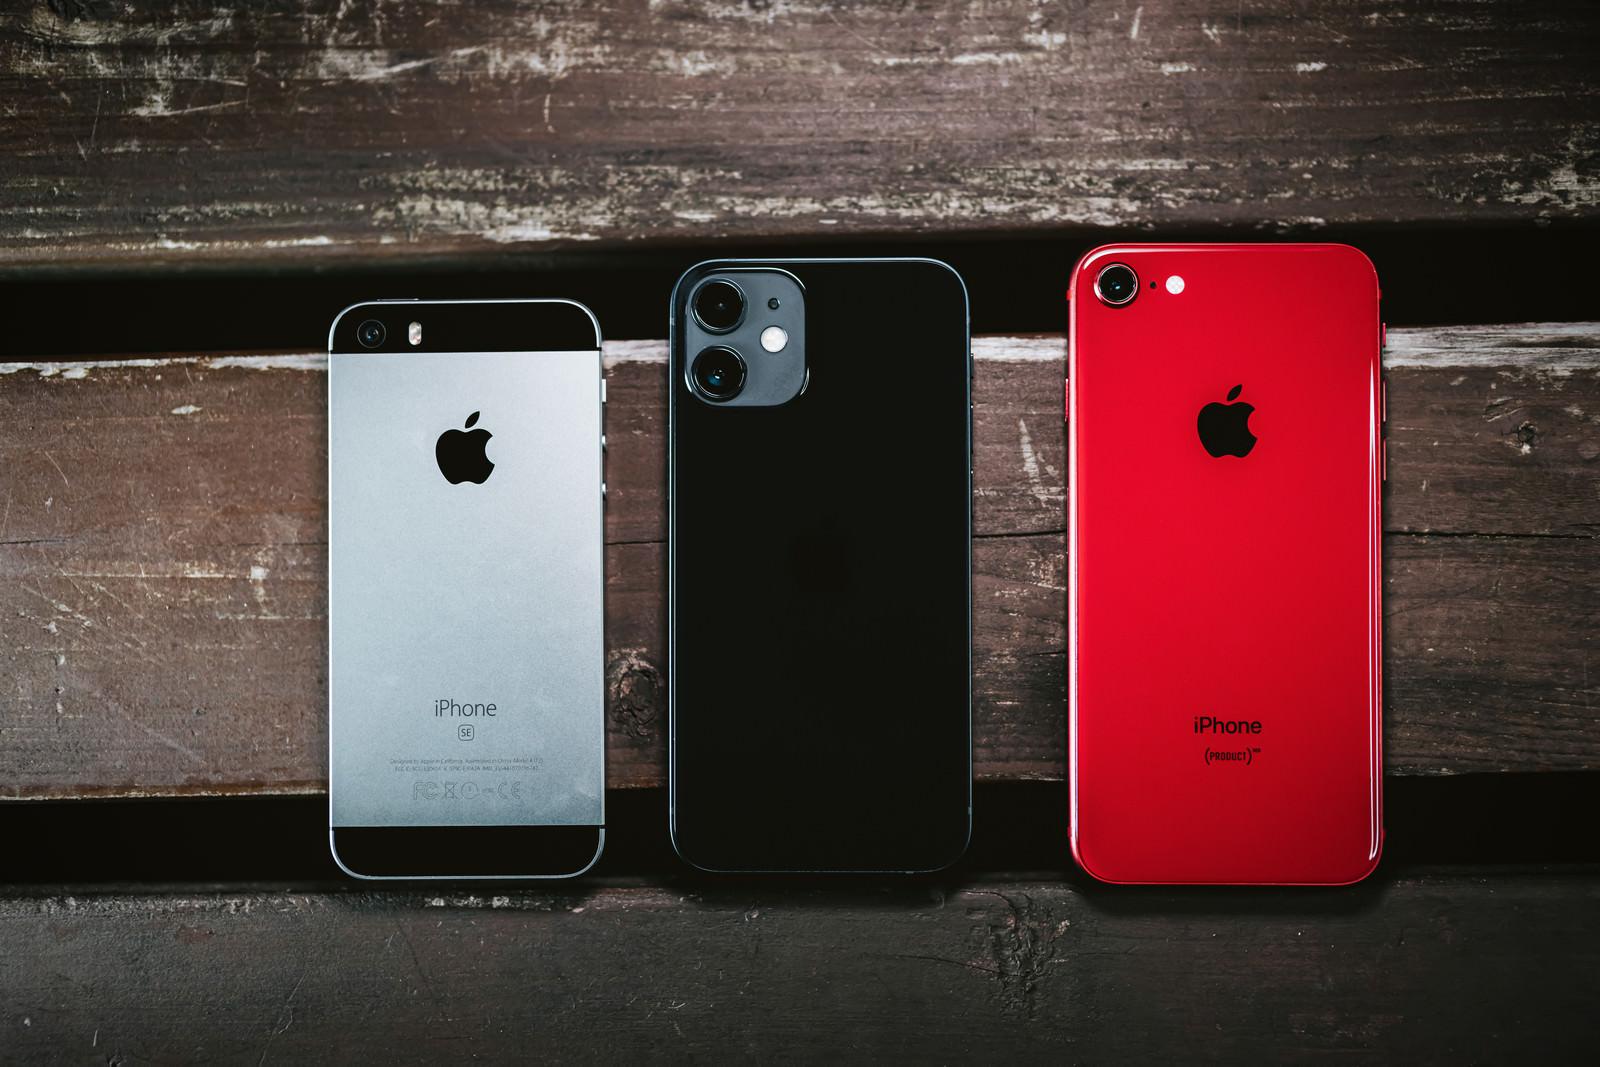 「iPhone SE と iPhone 12 iPhone X(RED) とのサイズ比較」の写真